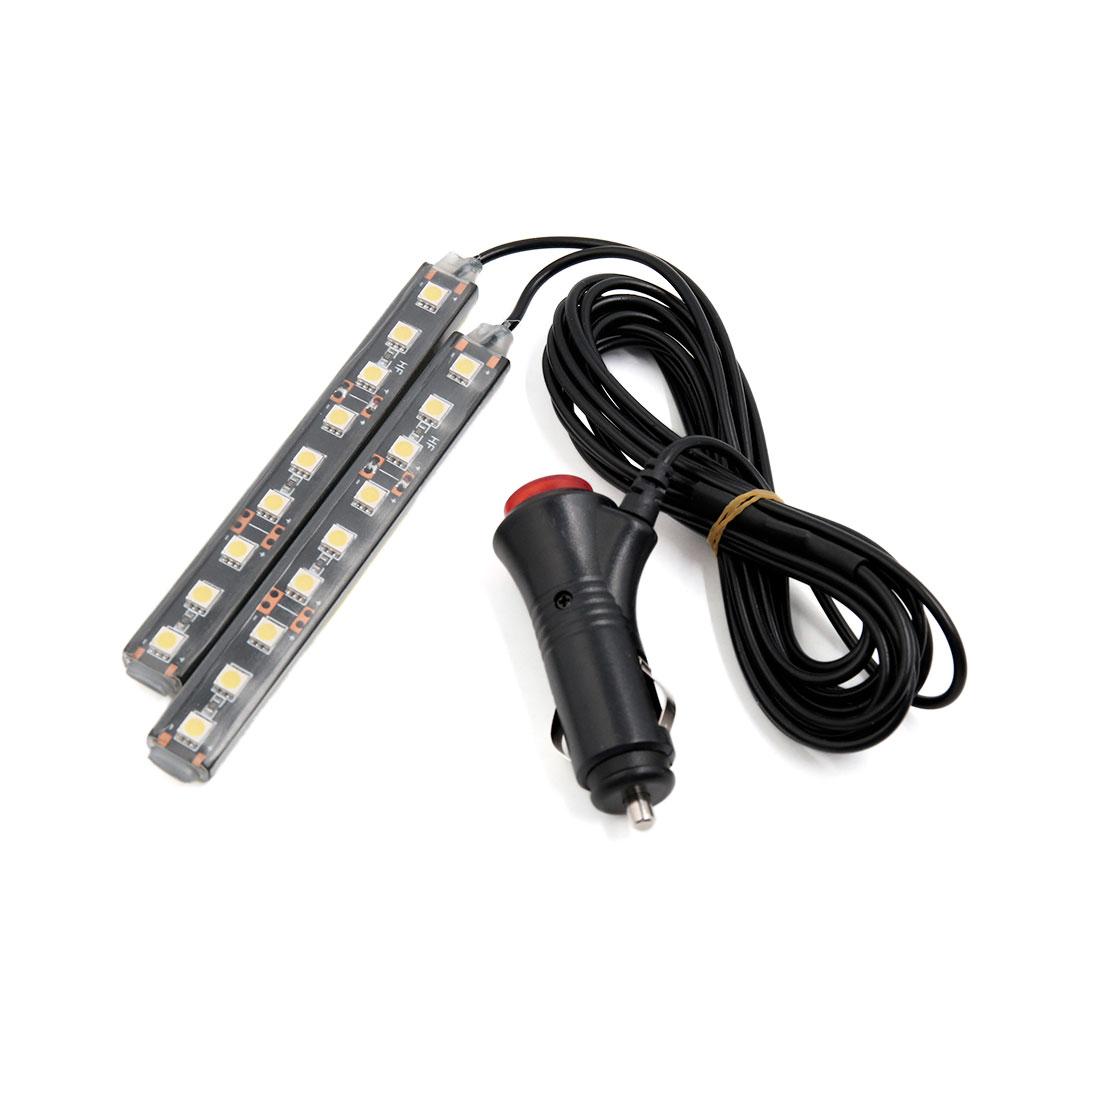 2Pcs 9 LED White Light Car Interior Atmosphere Floor Decorative Lamp Kit